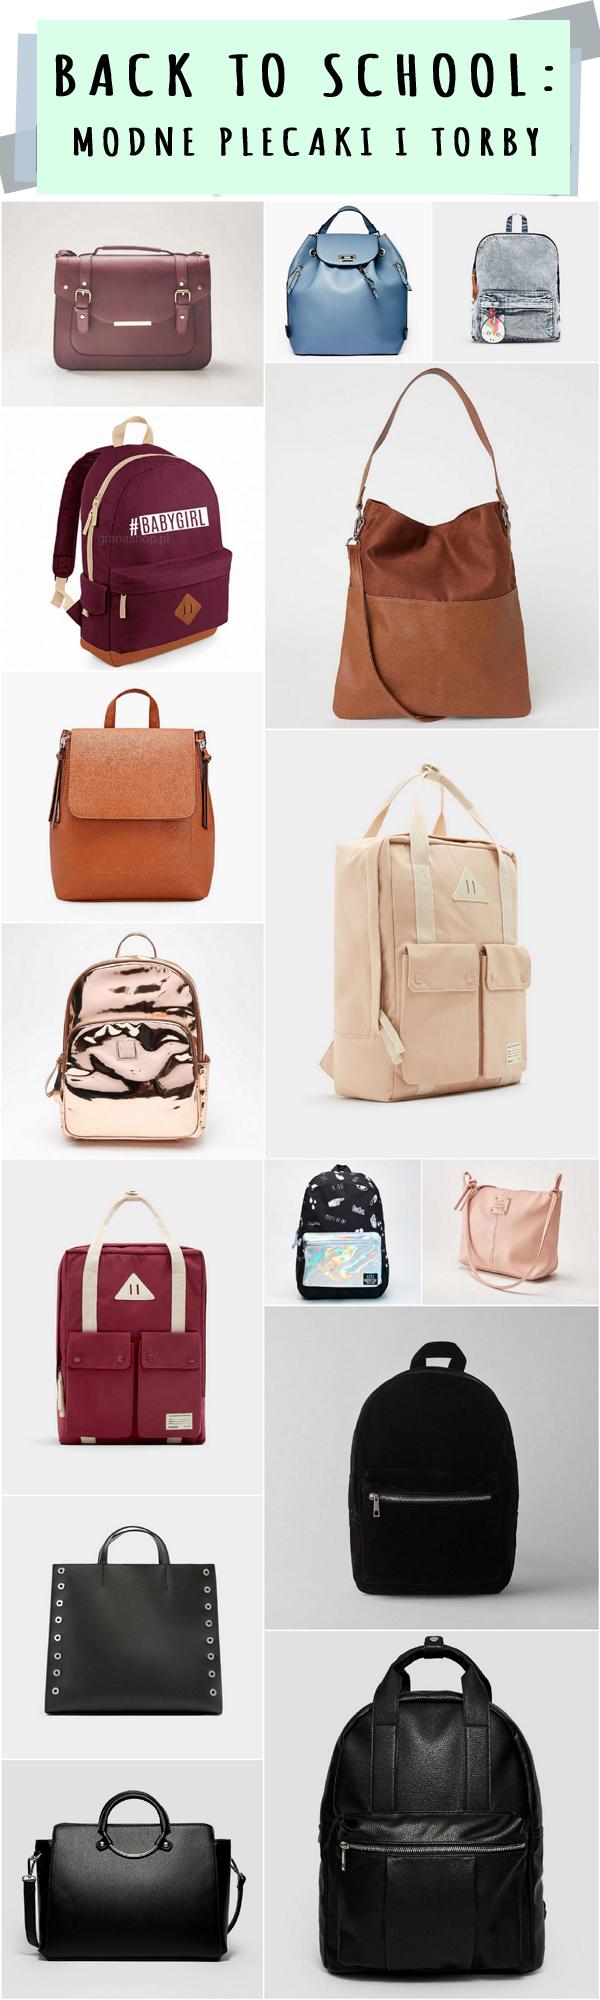 Modne plecaki i torby